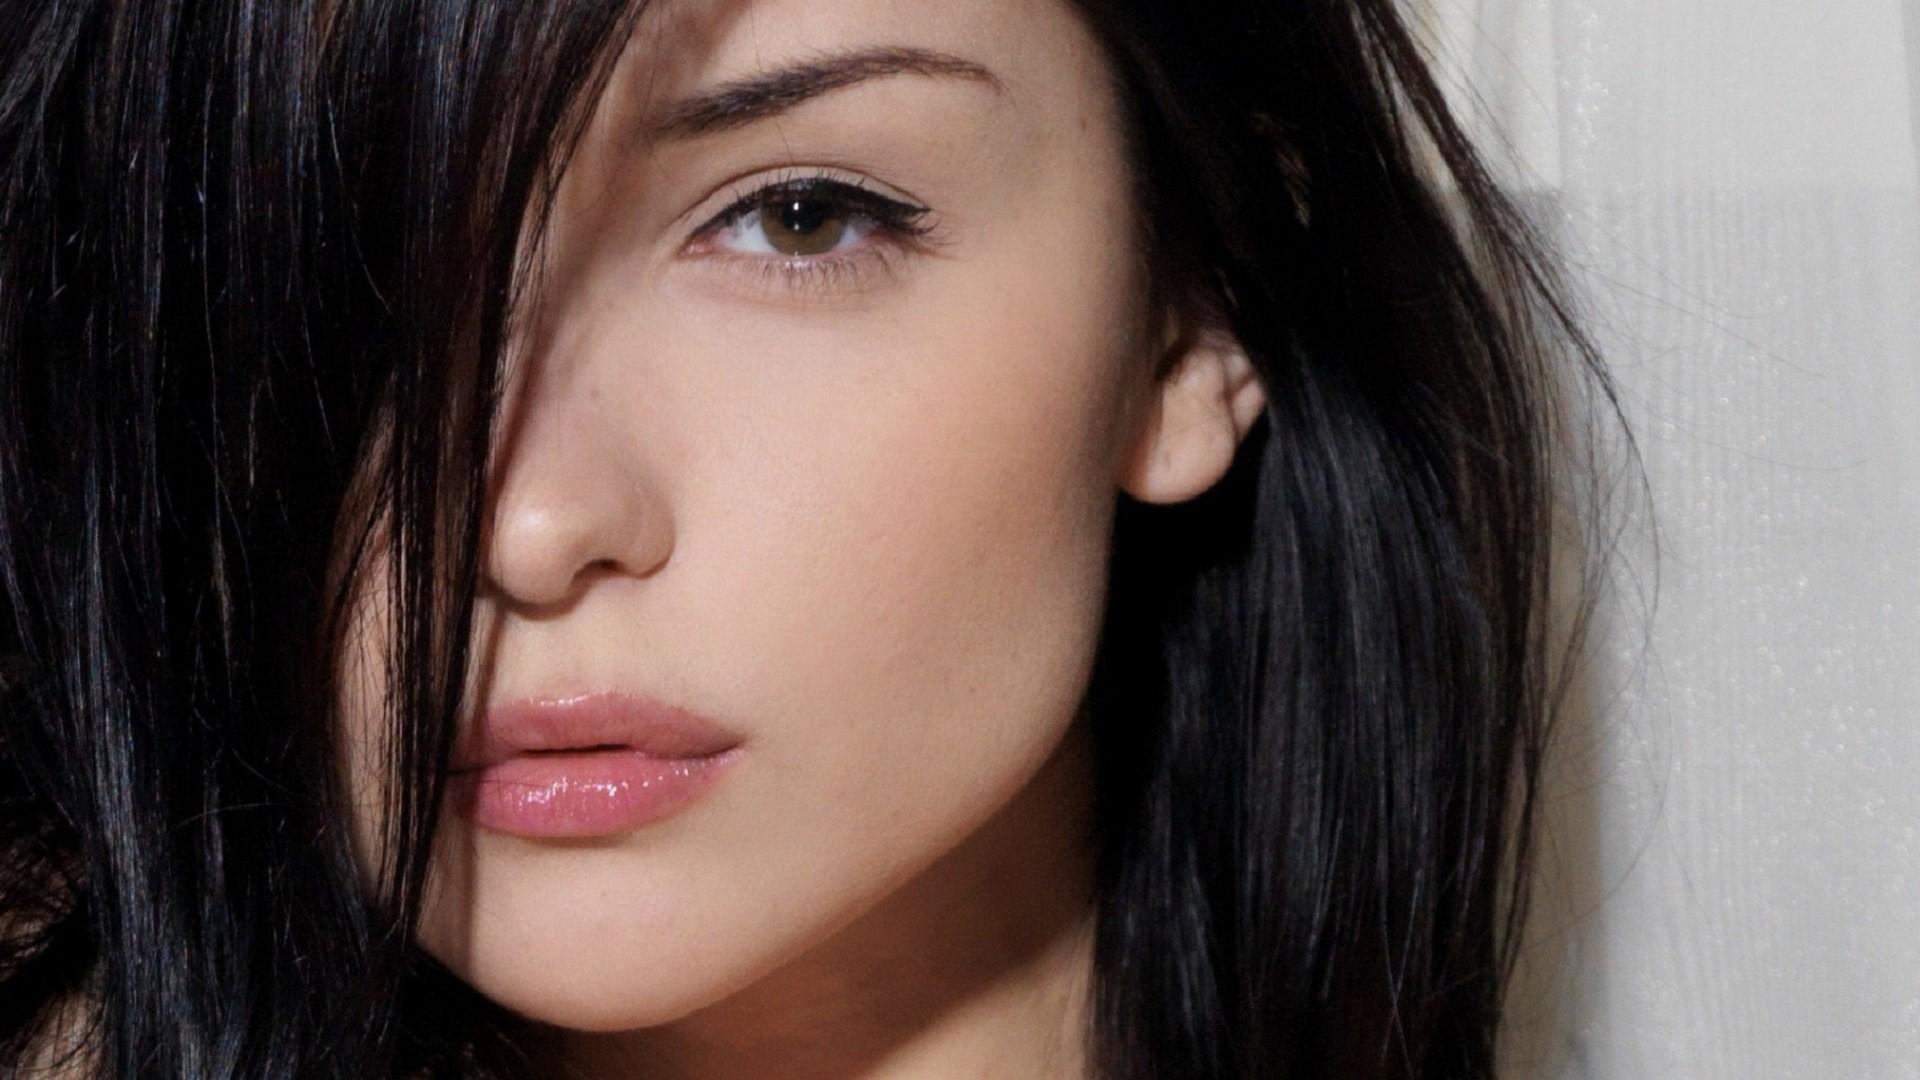 People 1920x1080 Katie Fey women model face closeup eyes lips black hair long hair brown eyes